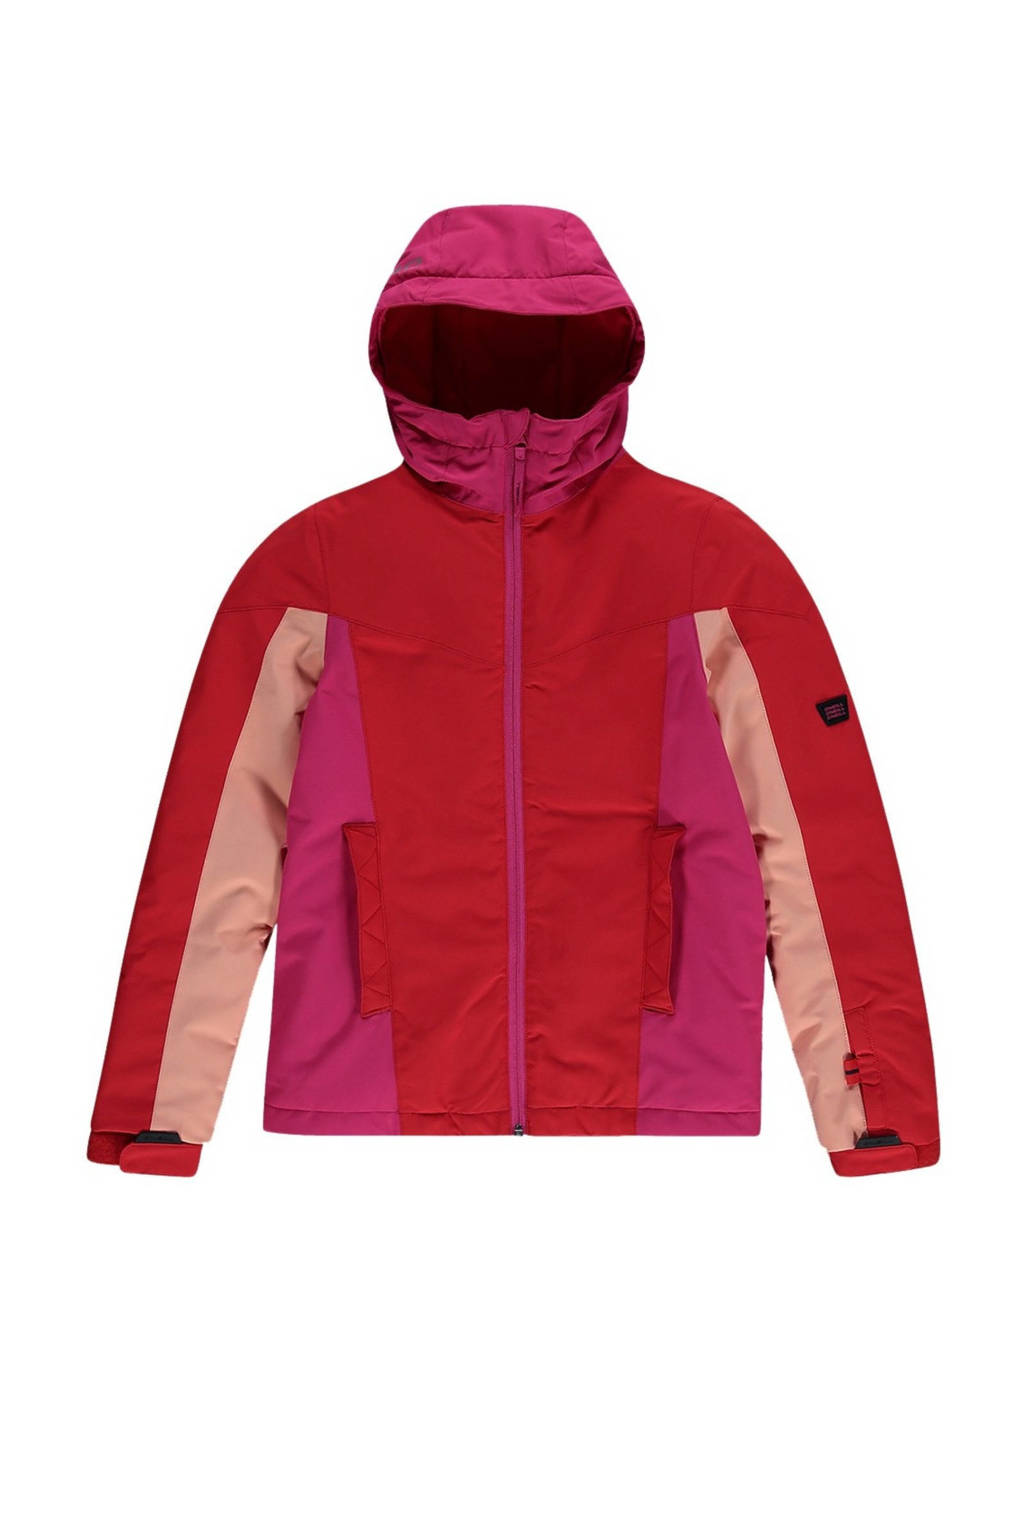 O'Neill ski-jack Blaze rood/roze, Fiery red